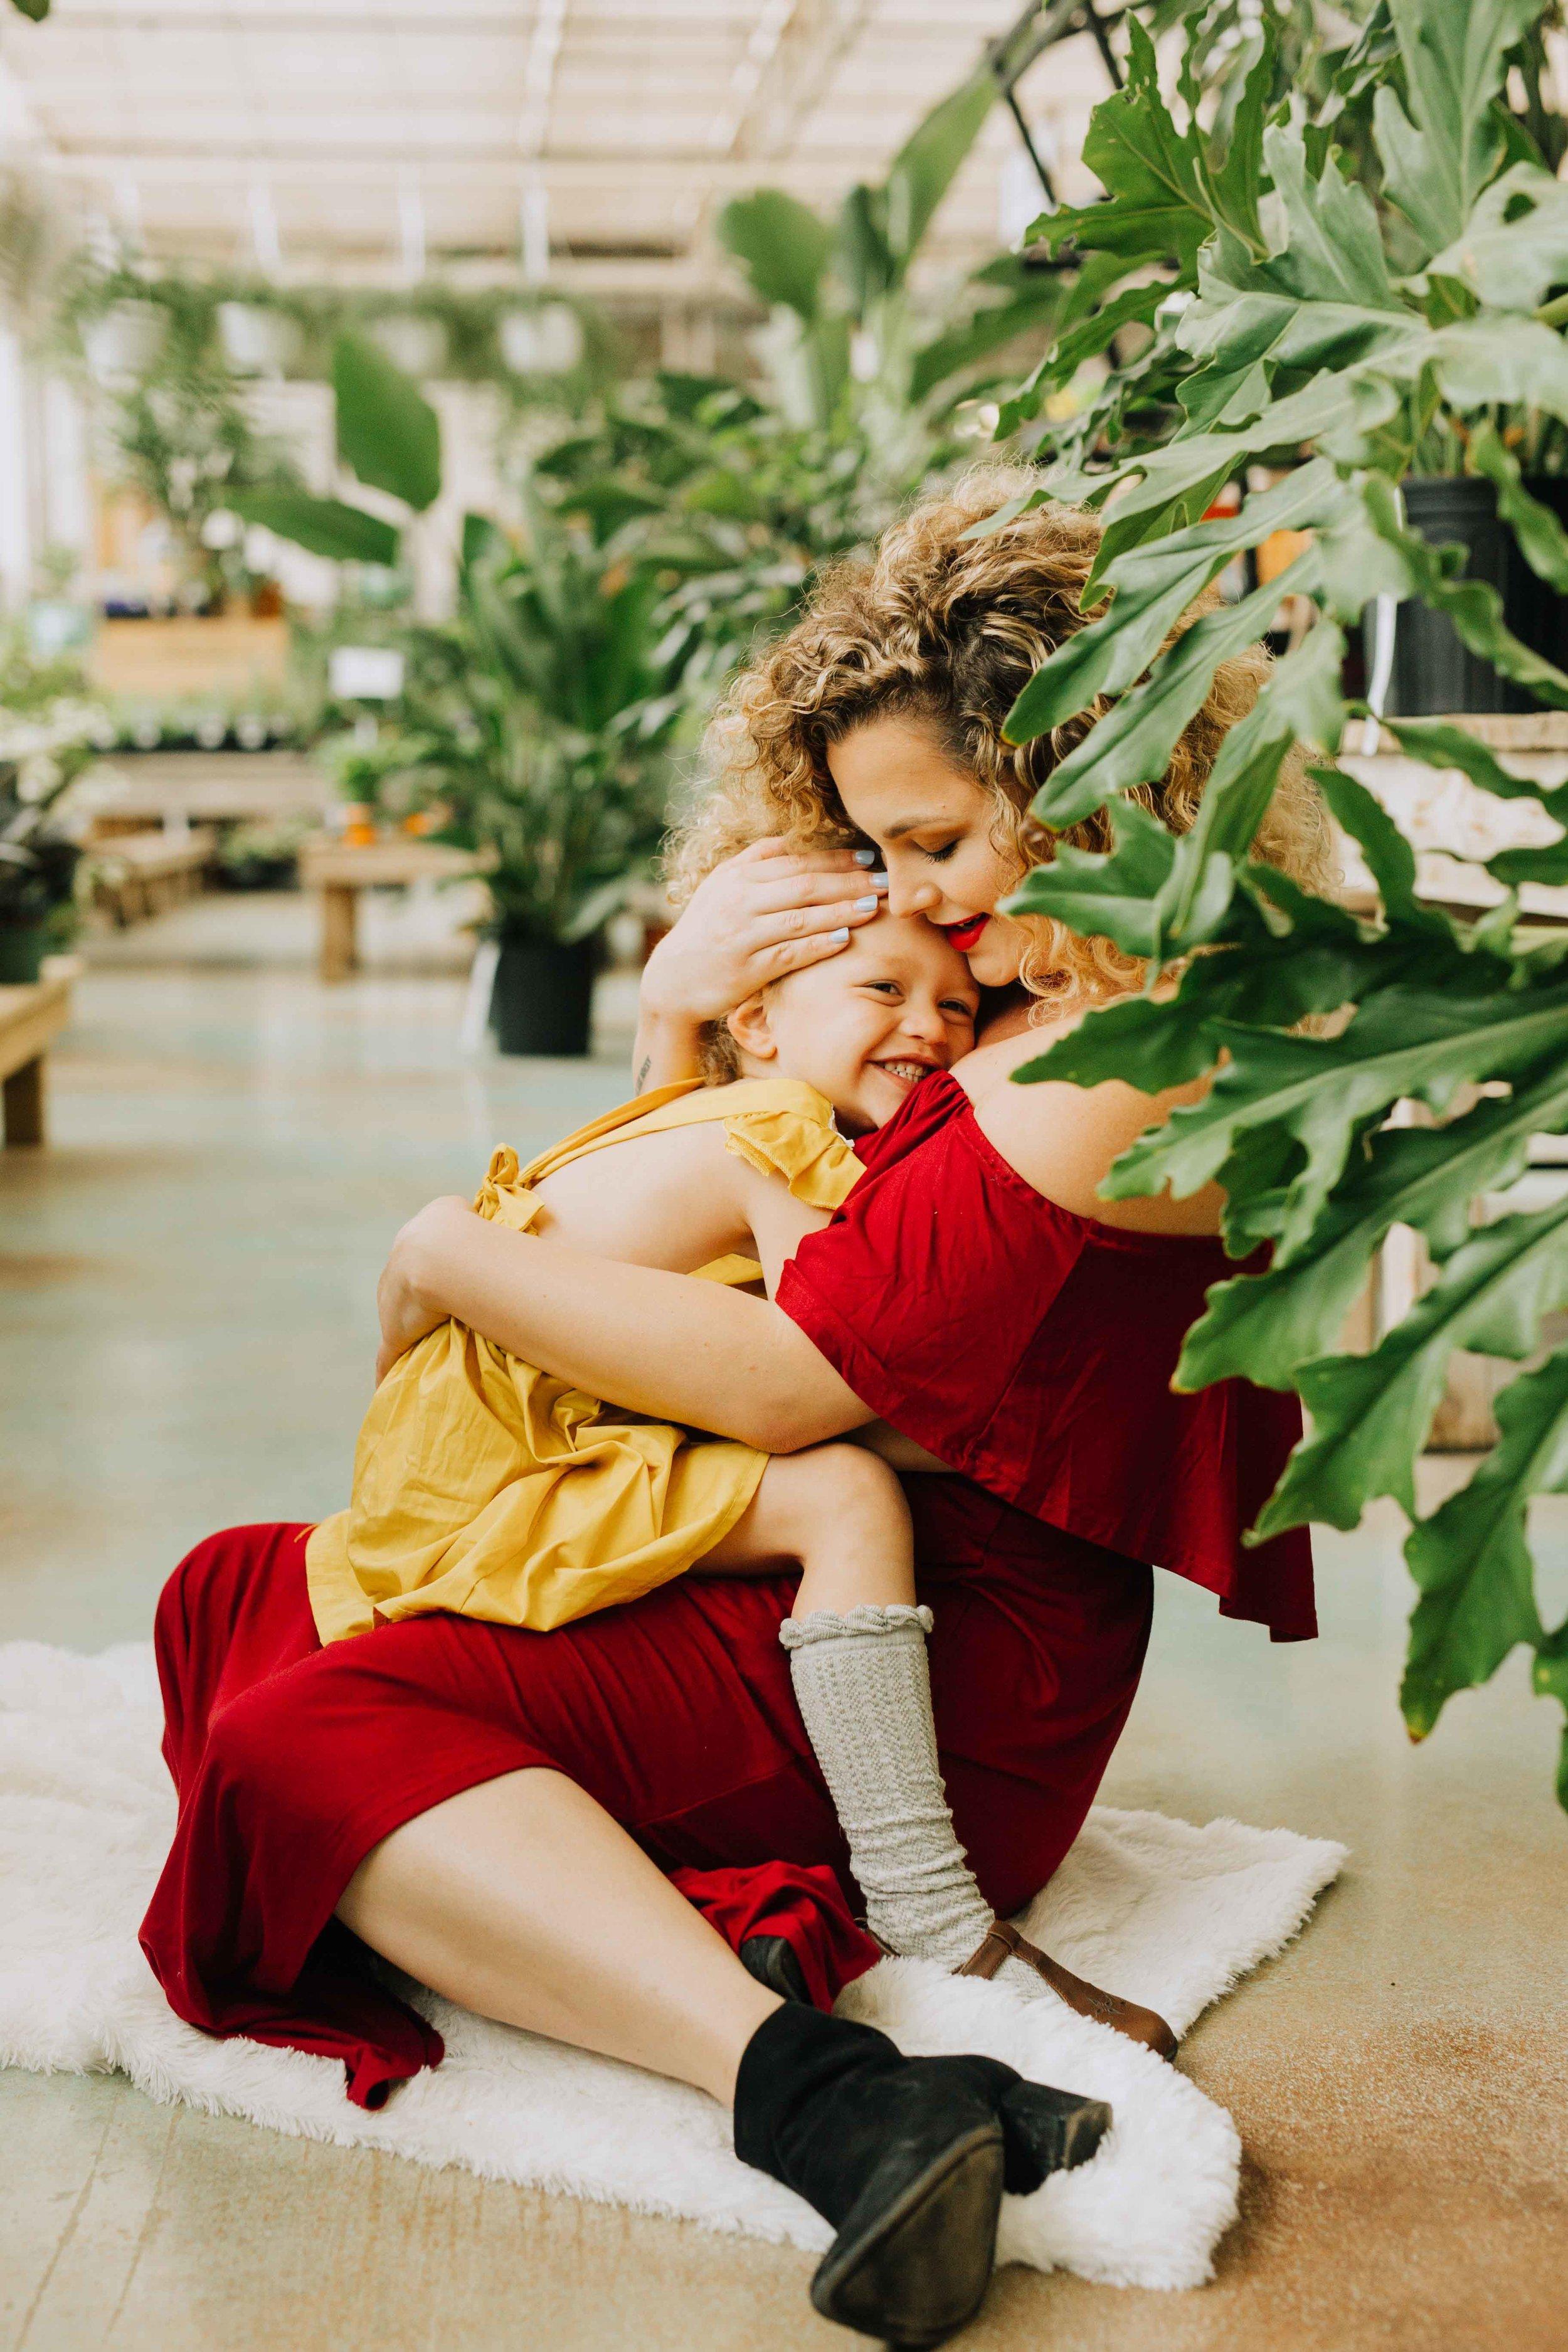 Merrifield-garden-greenhouse-indoor-Jacqueline-Waters-Photography-Red-dress-family- (143).jpg